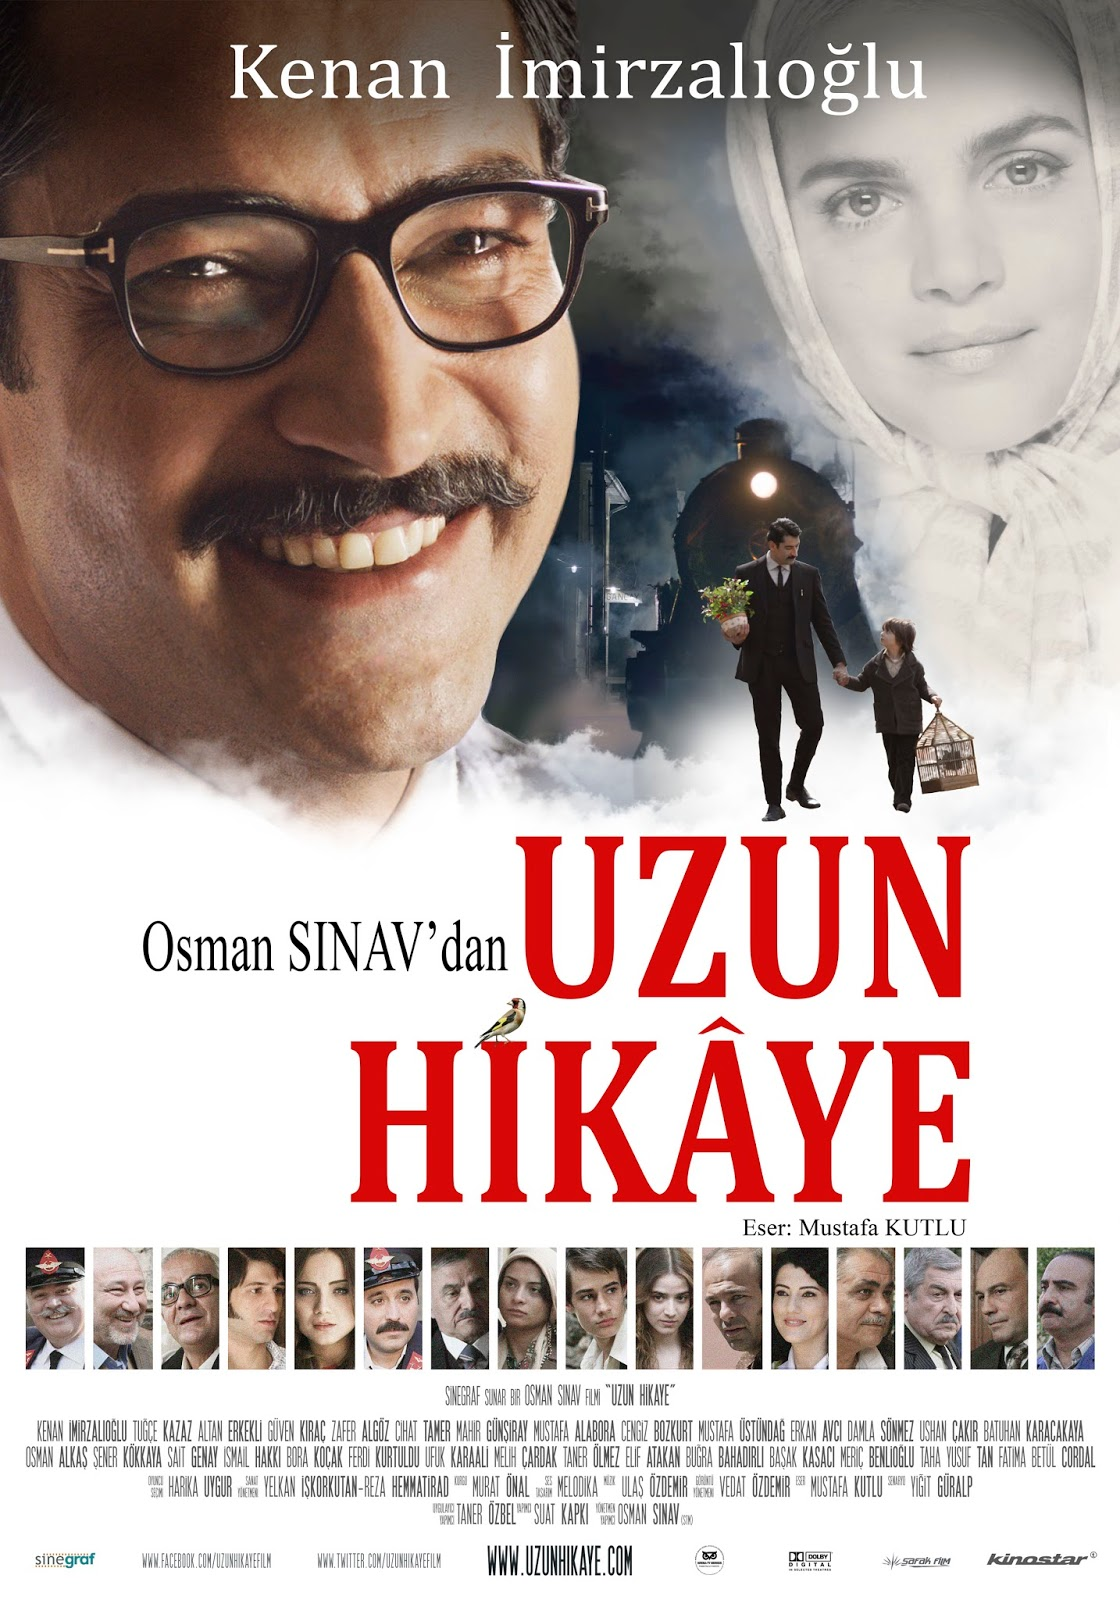 Pelicula Uzun hikâye (una larga historia) 2012 online